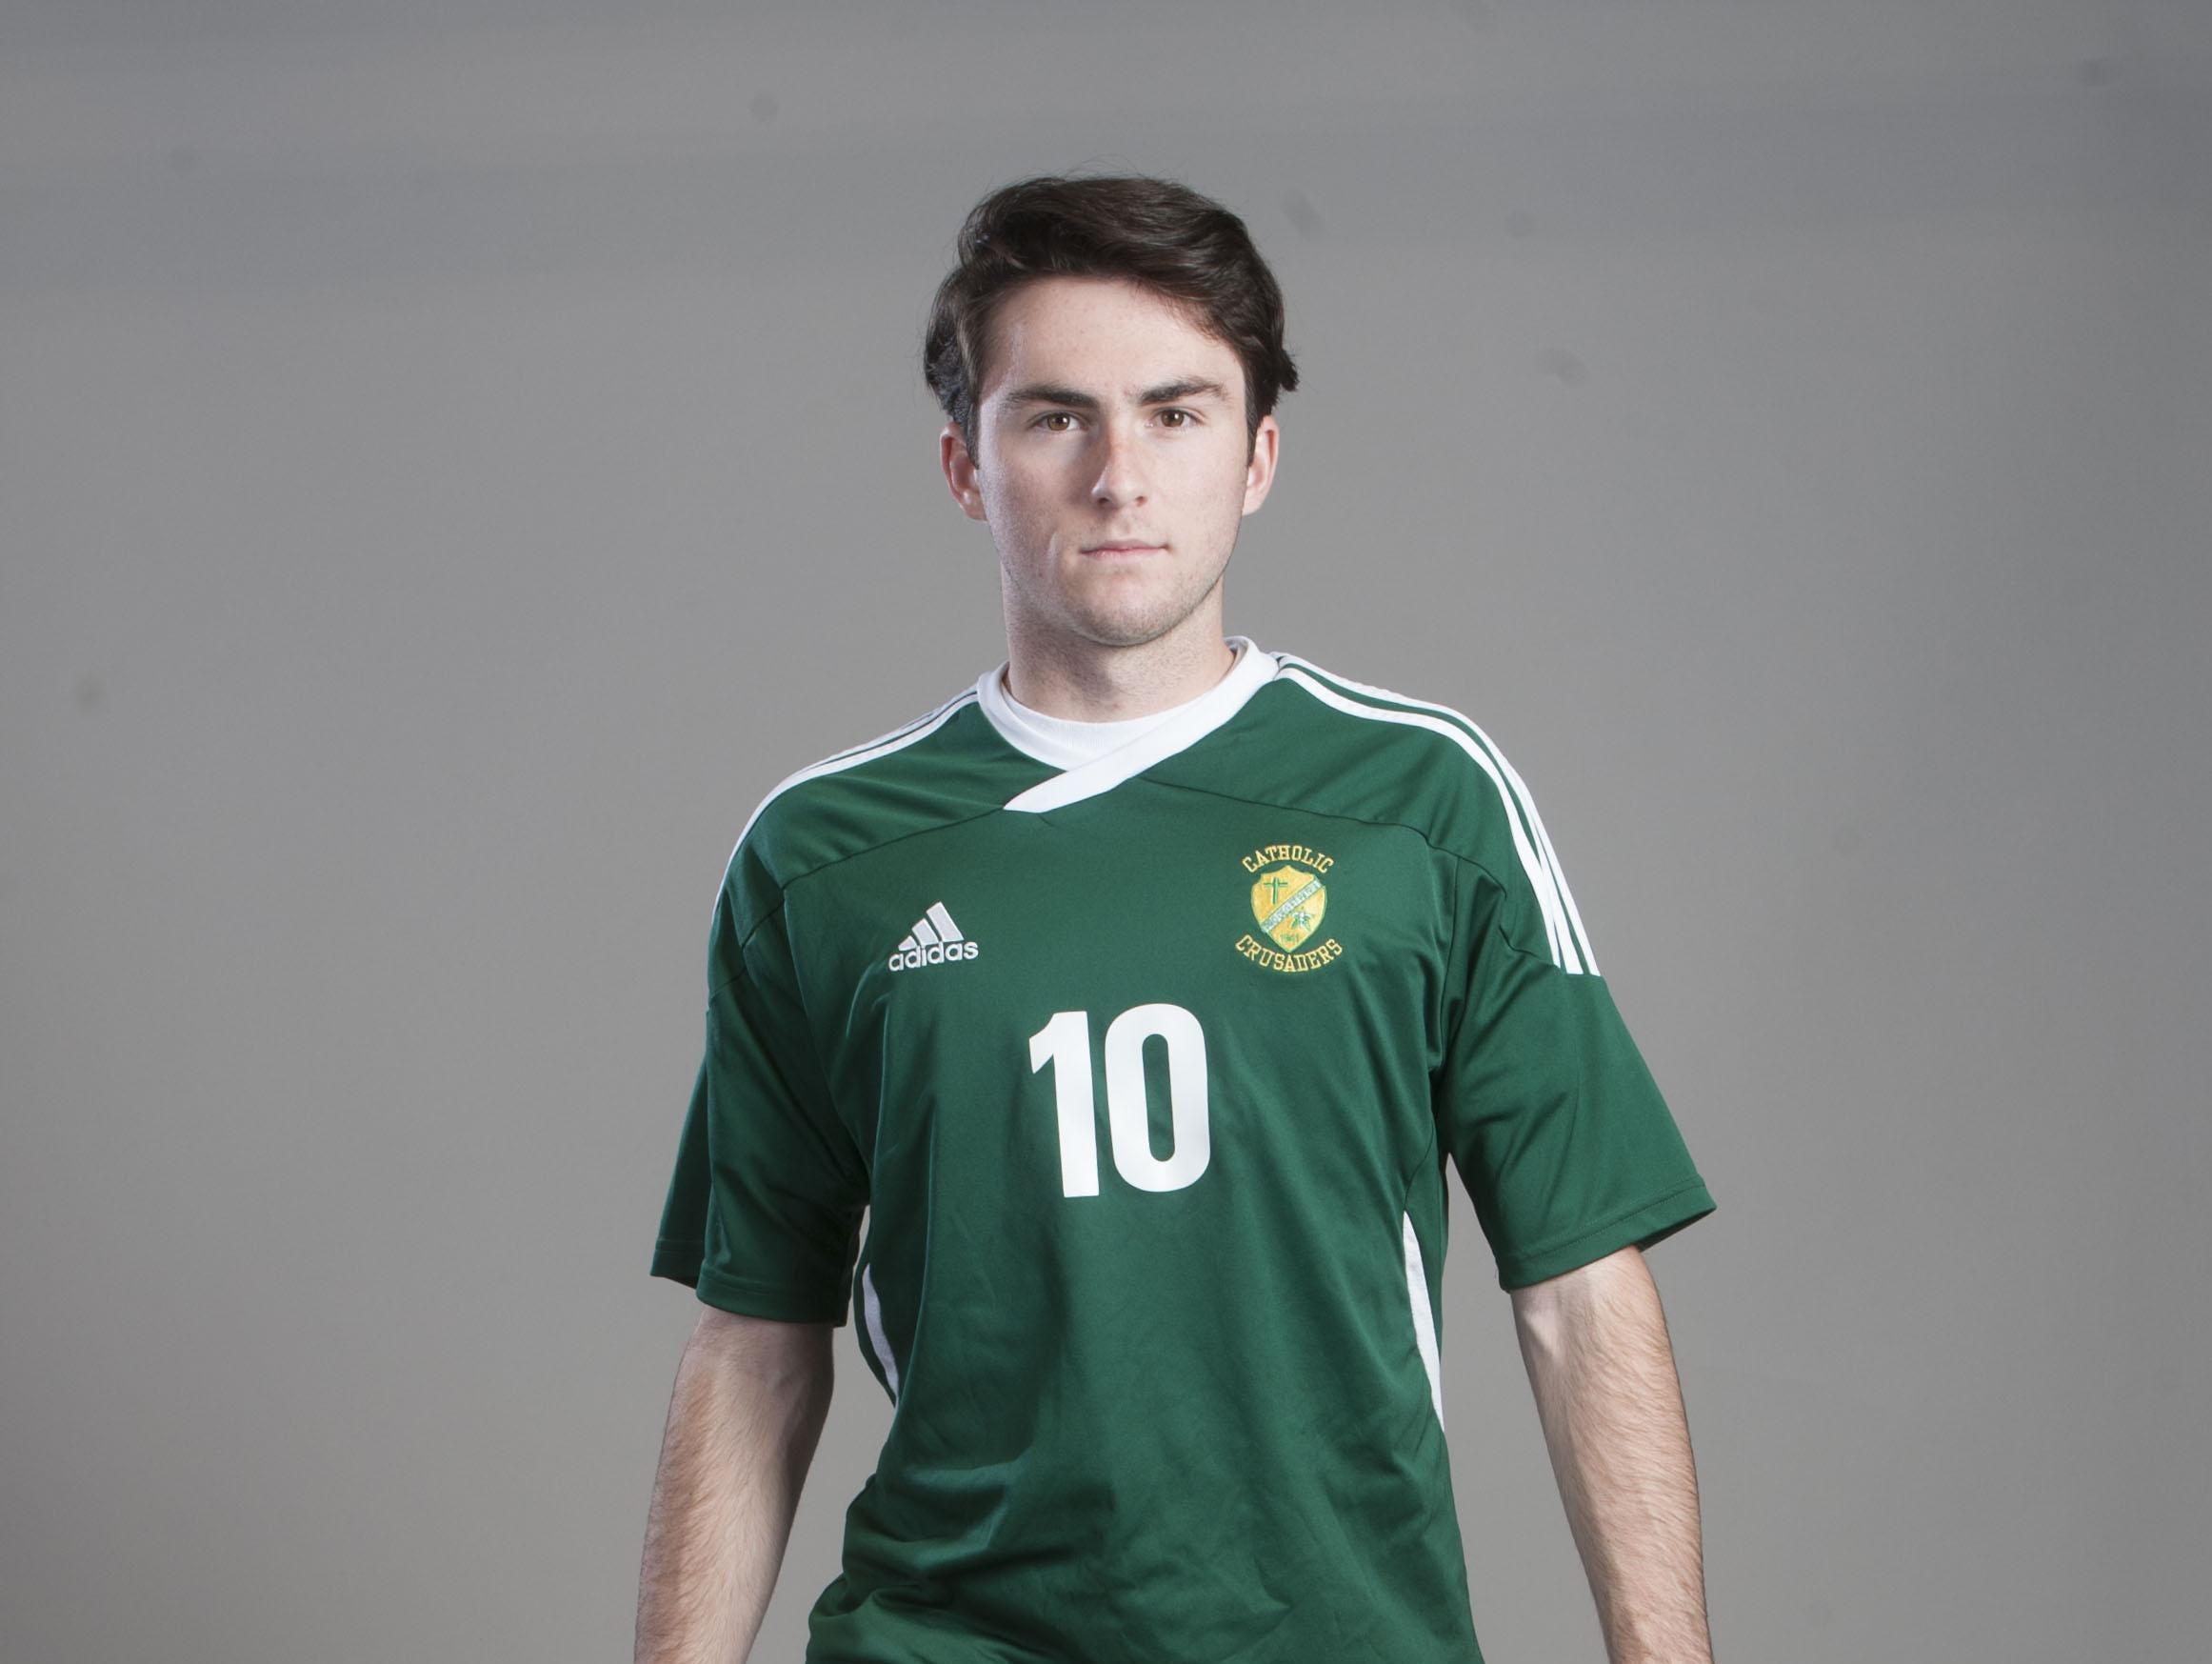 Billy Harris, Catholic High boys soccer